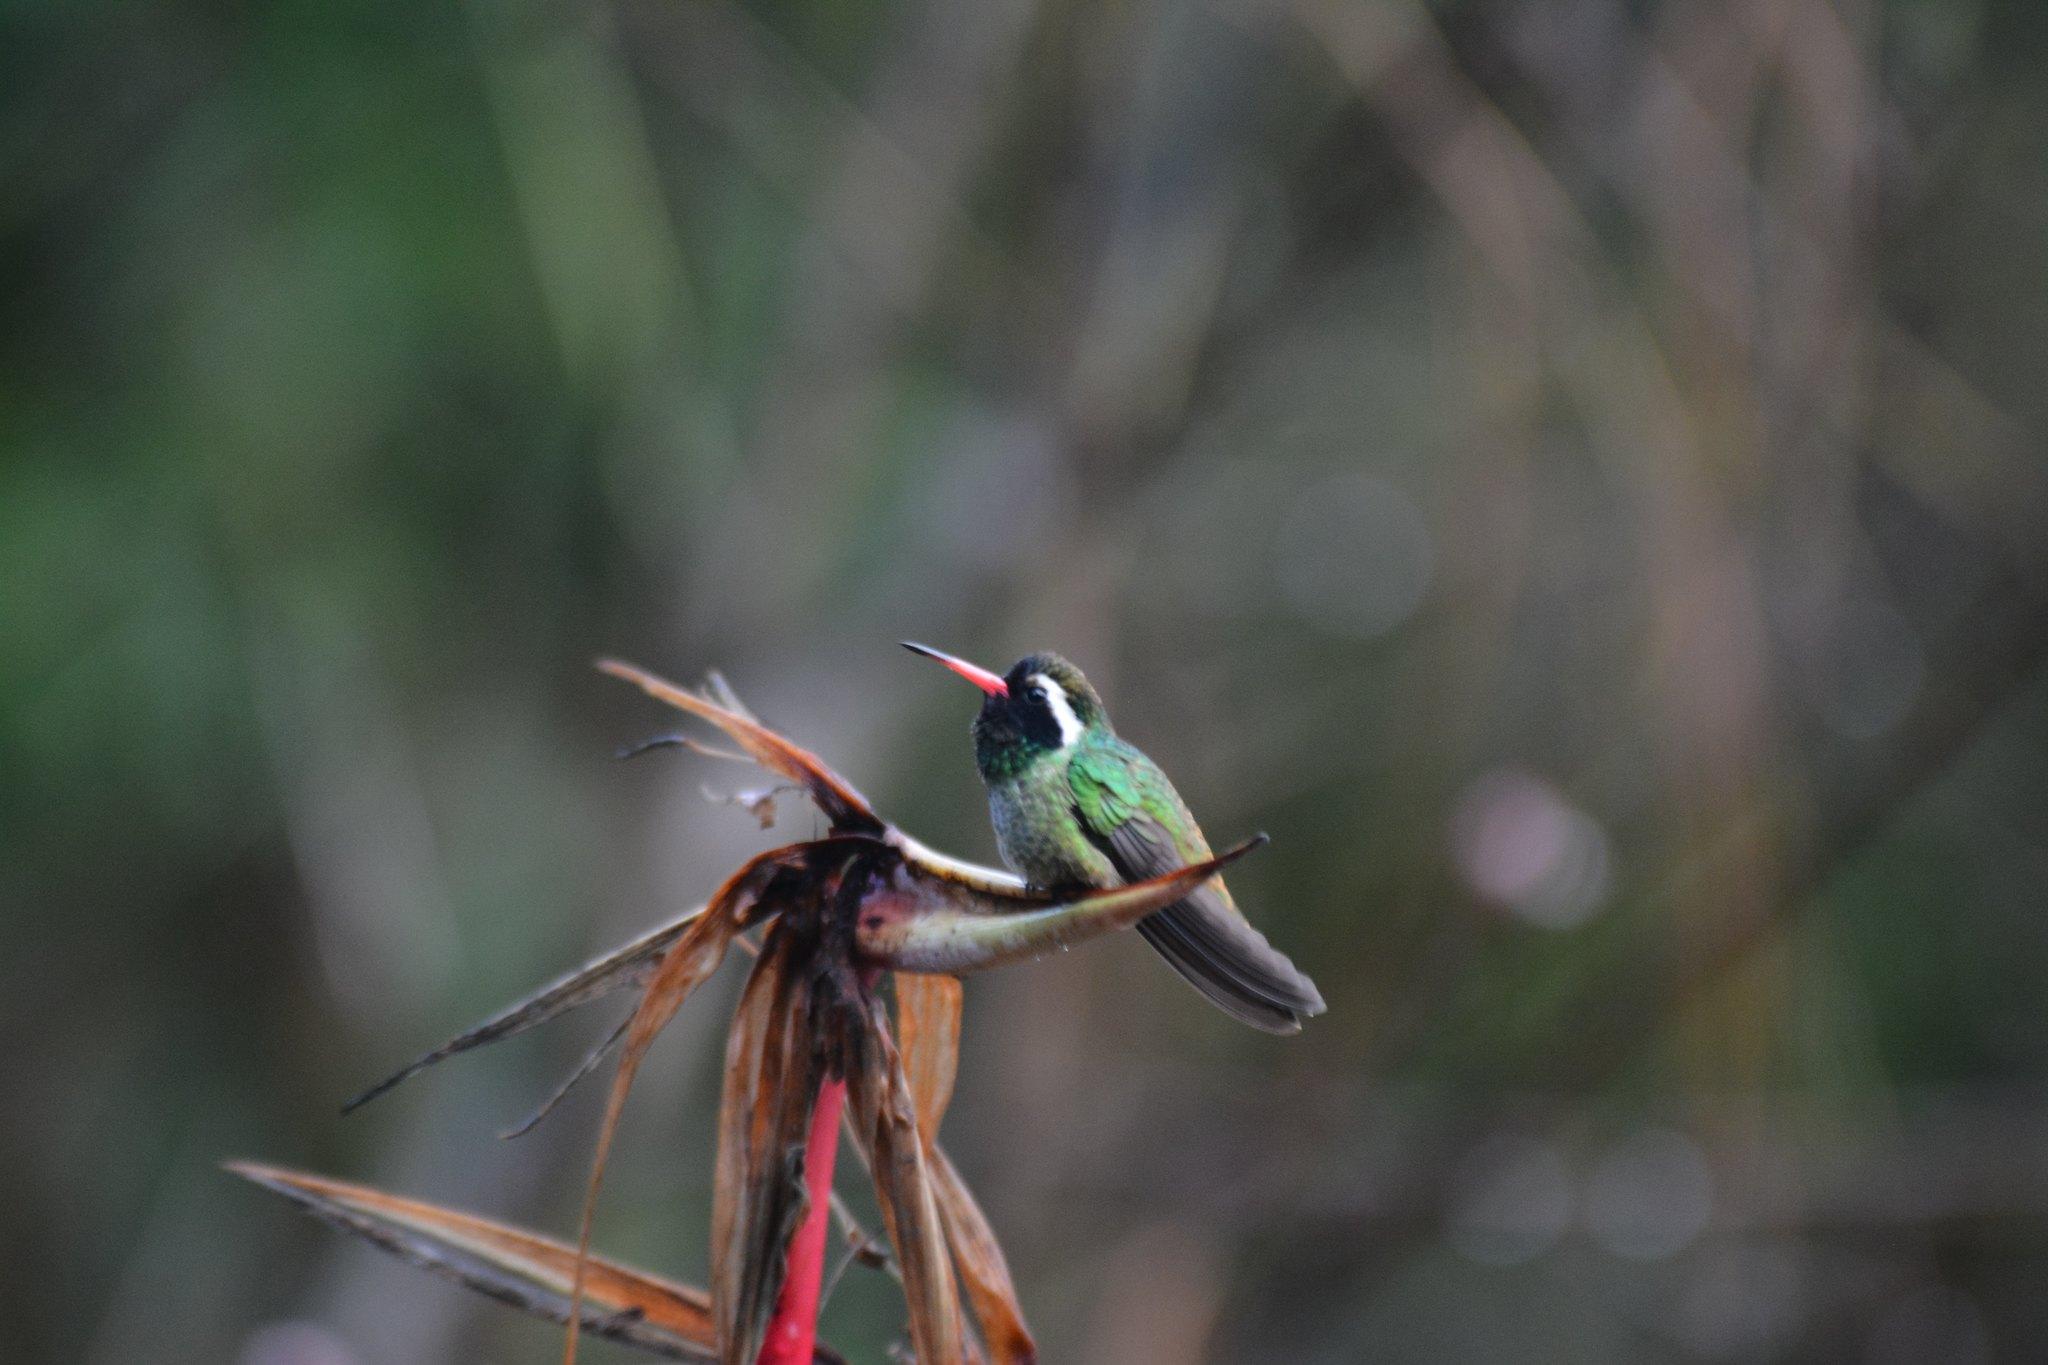 White-eared Hummingbird - Reserva Ecológica Sierra de San Juan--La Noria, MX 3